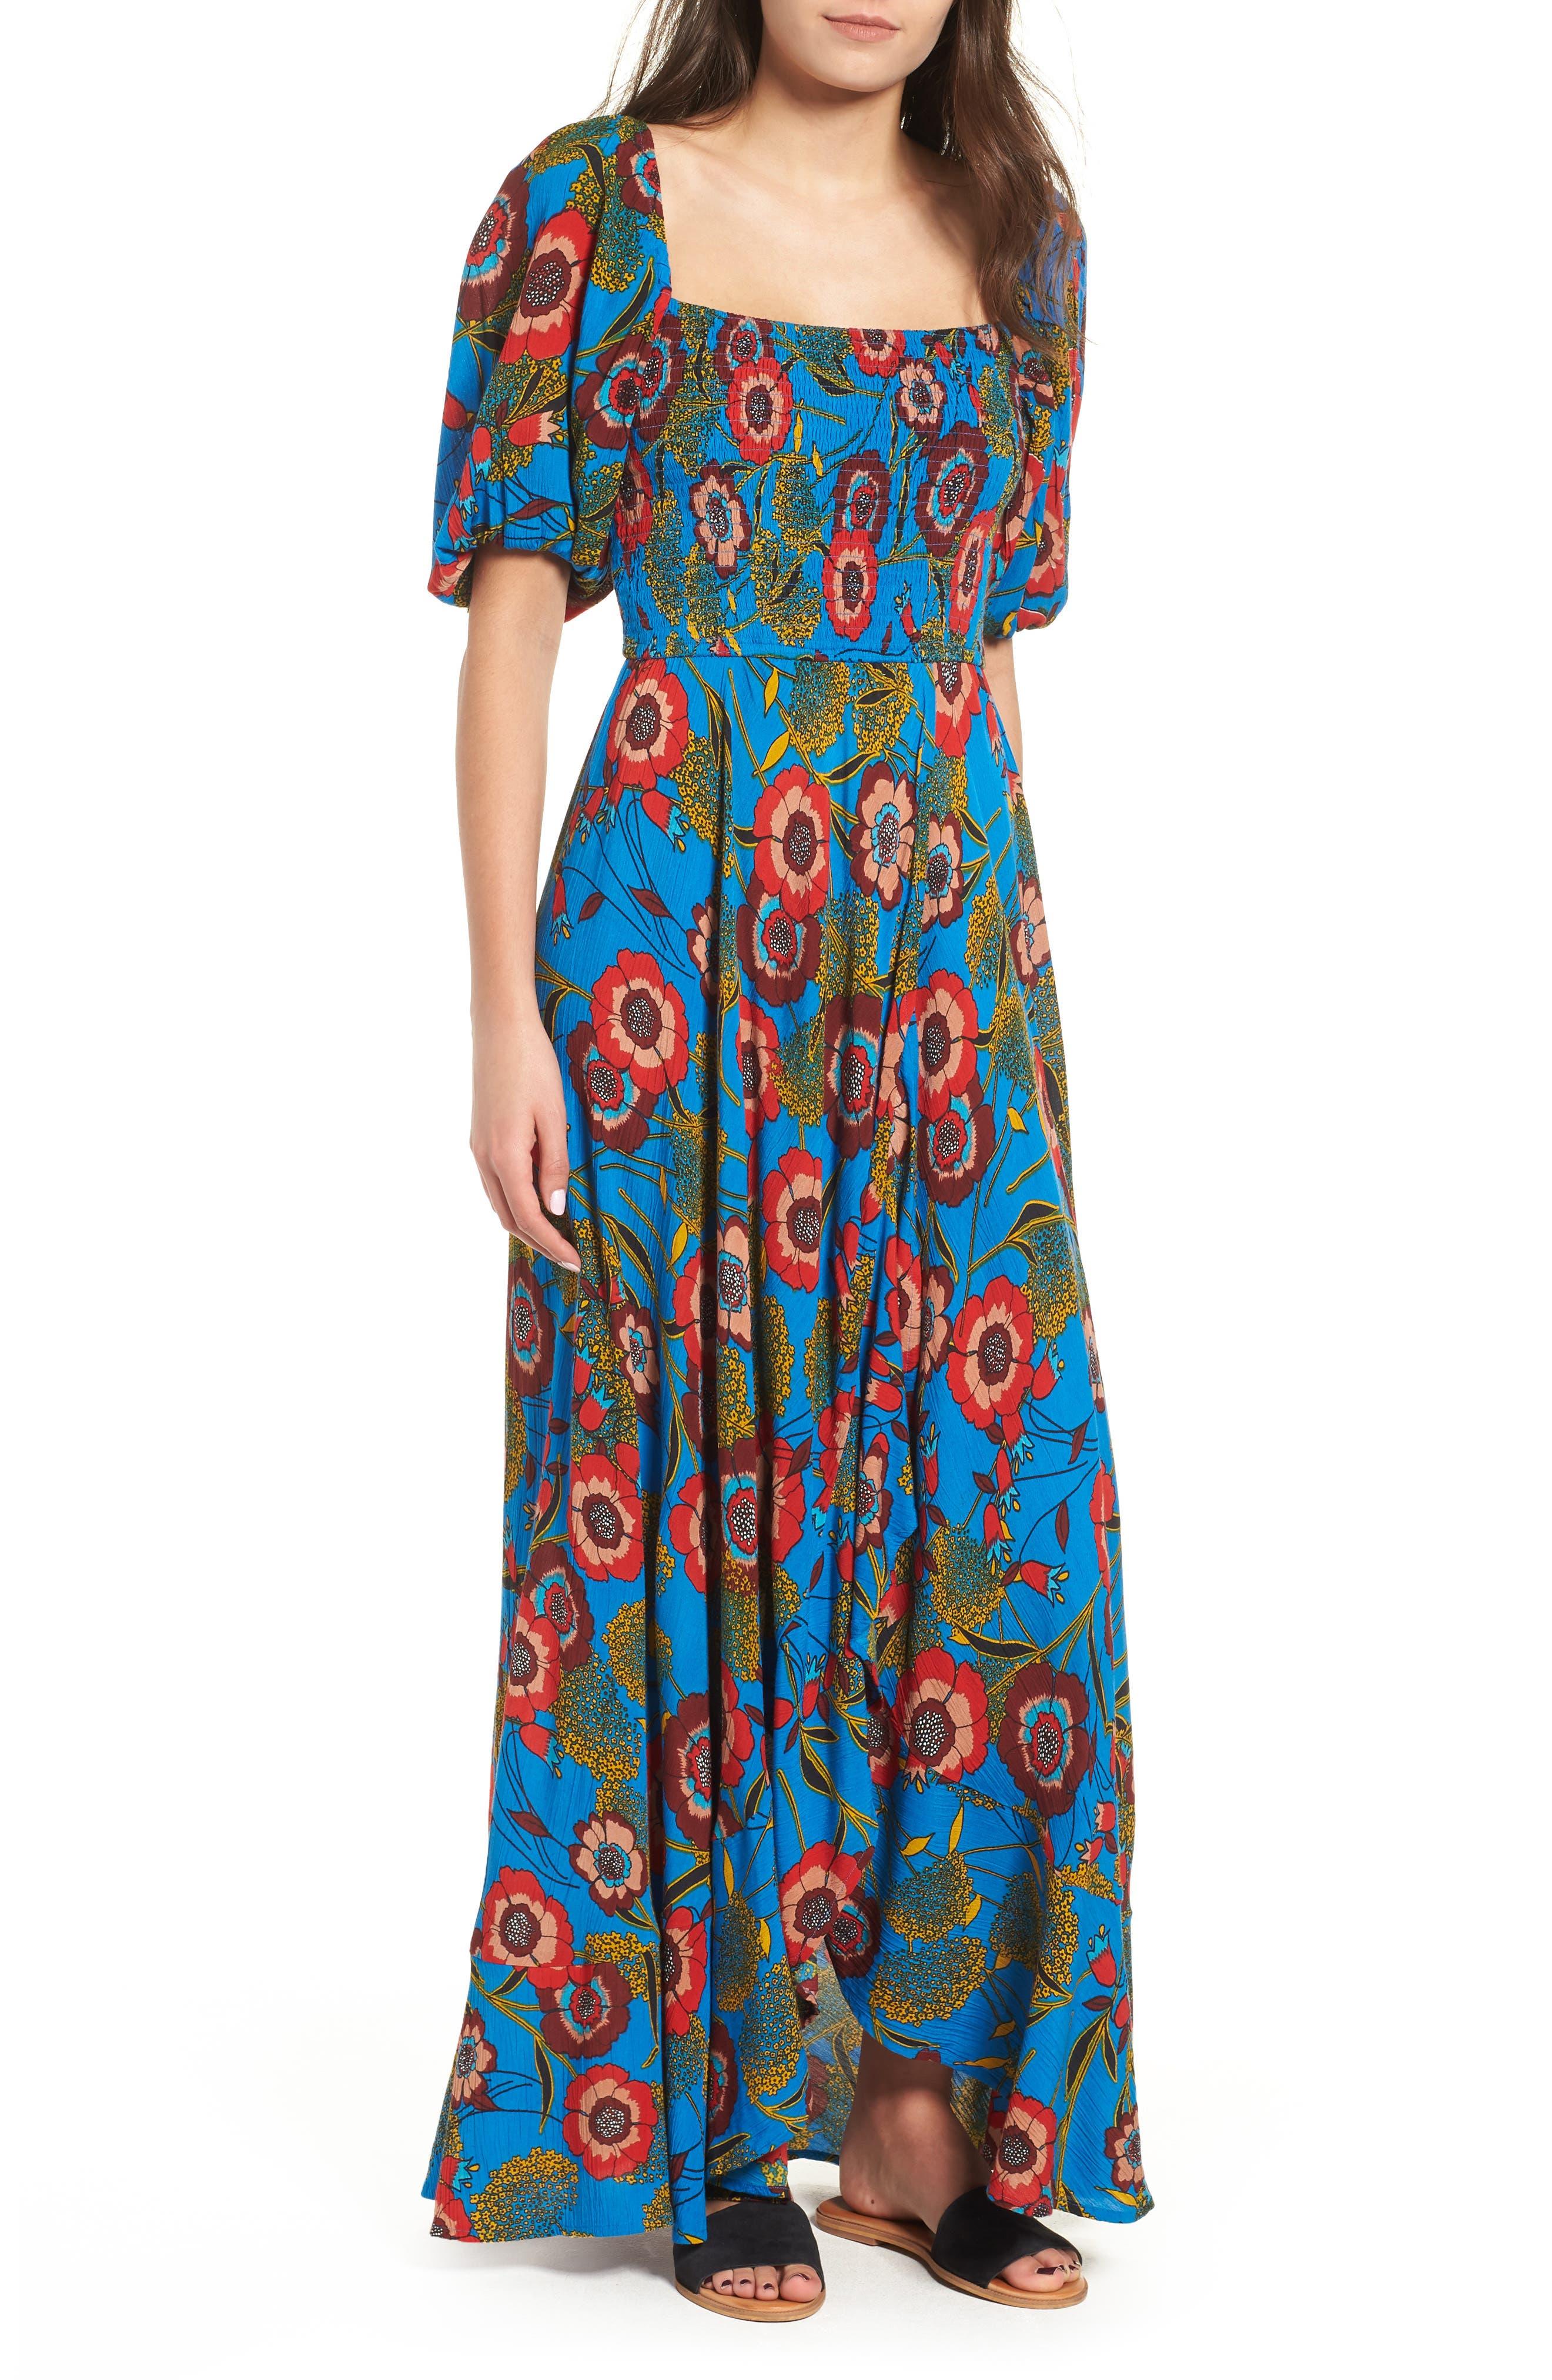 Heirloom Blossom Maxi Dress,                         Main,                         color, Royal/ Blue/ Red